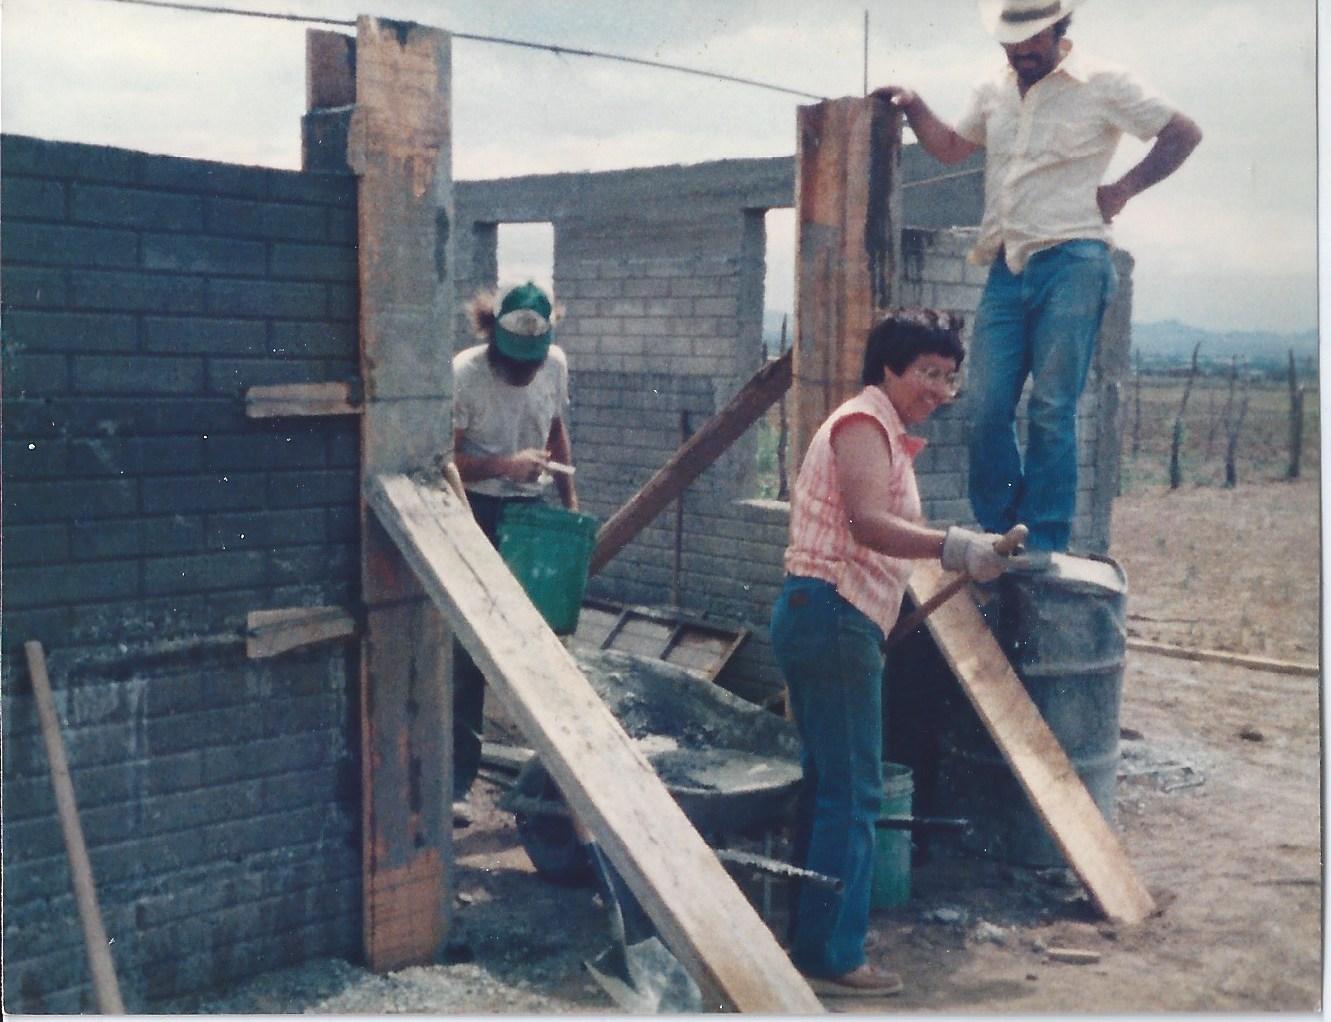 norma helping build